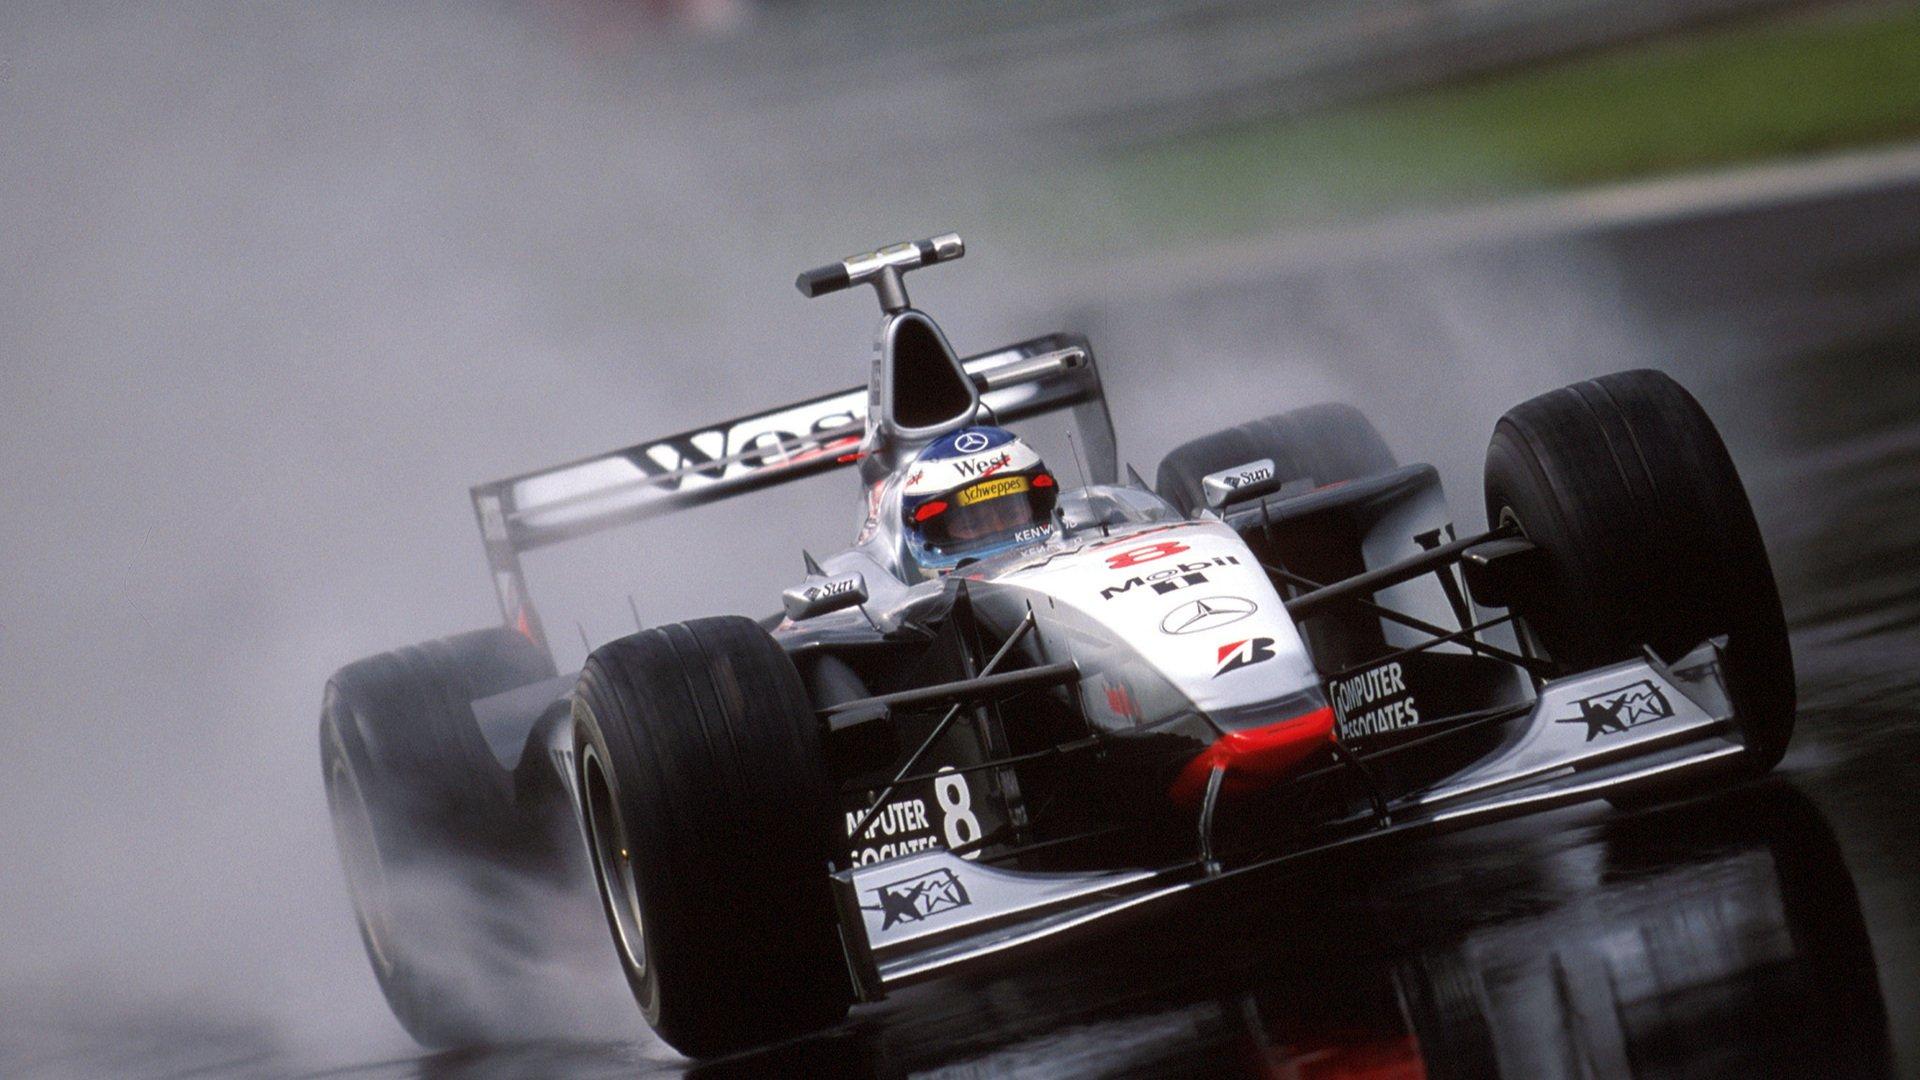 Mclaren Formula 1 Hd Wallpaper